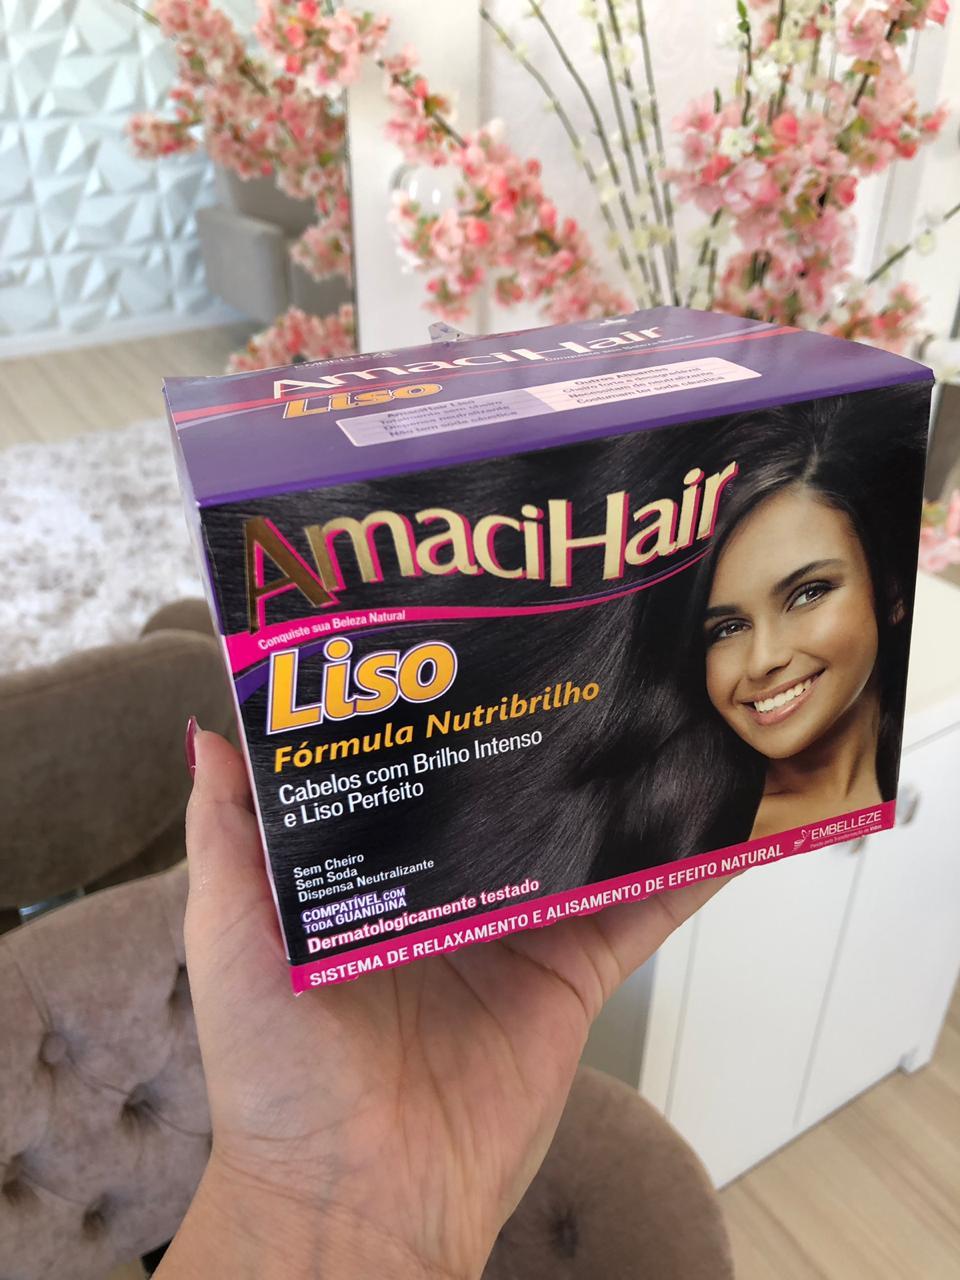 como-relaxar-o-cabelo-com-creme-relaxante-amacihair-da-embelleze-liso